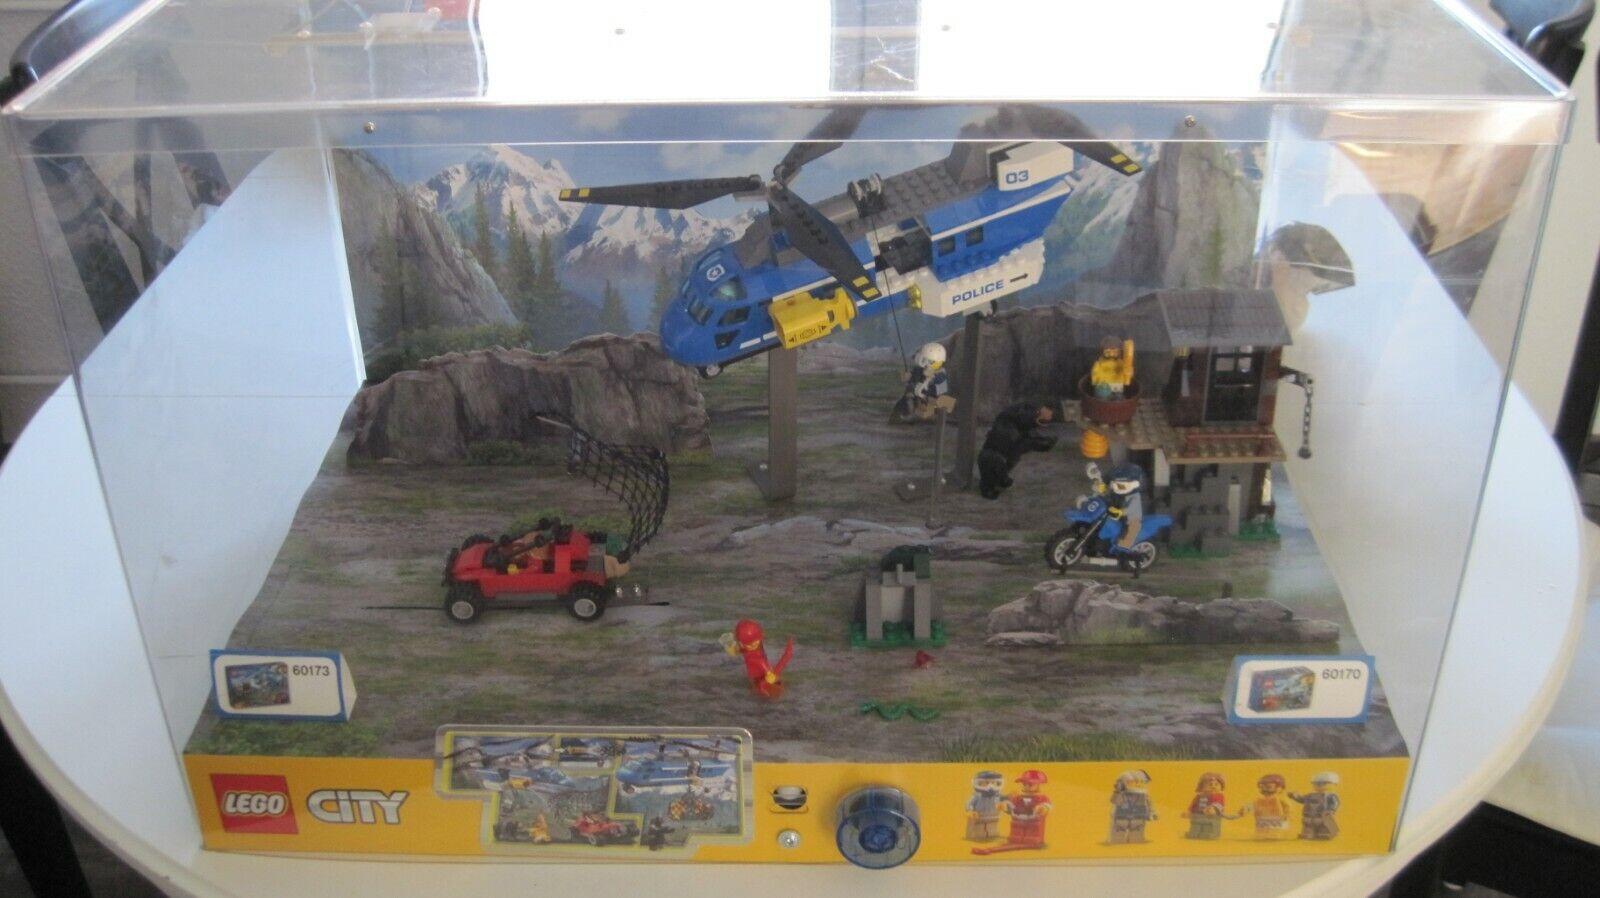 Lego City desfilando con iluminación